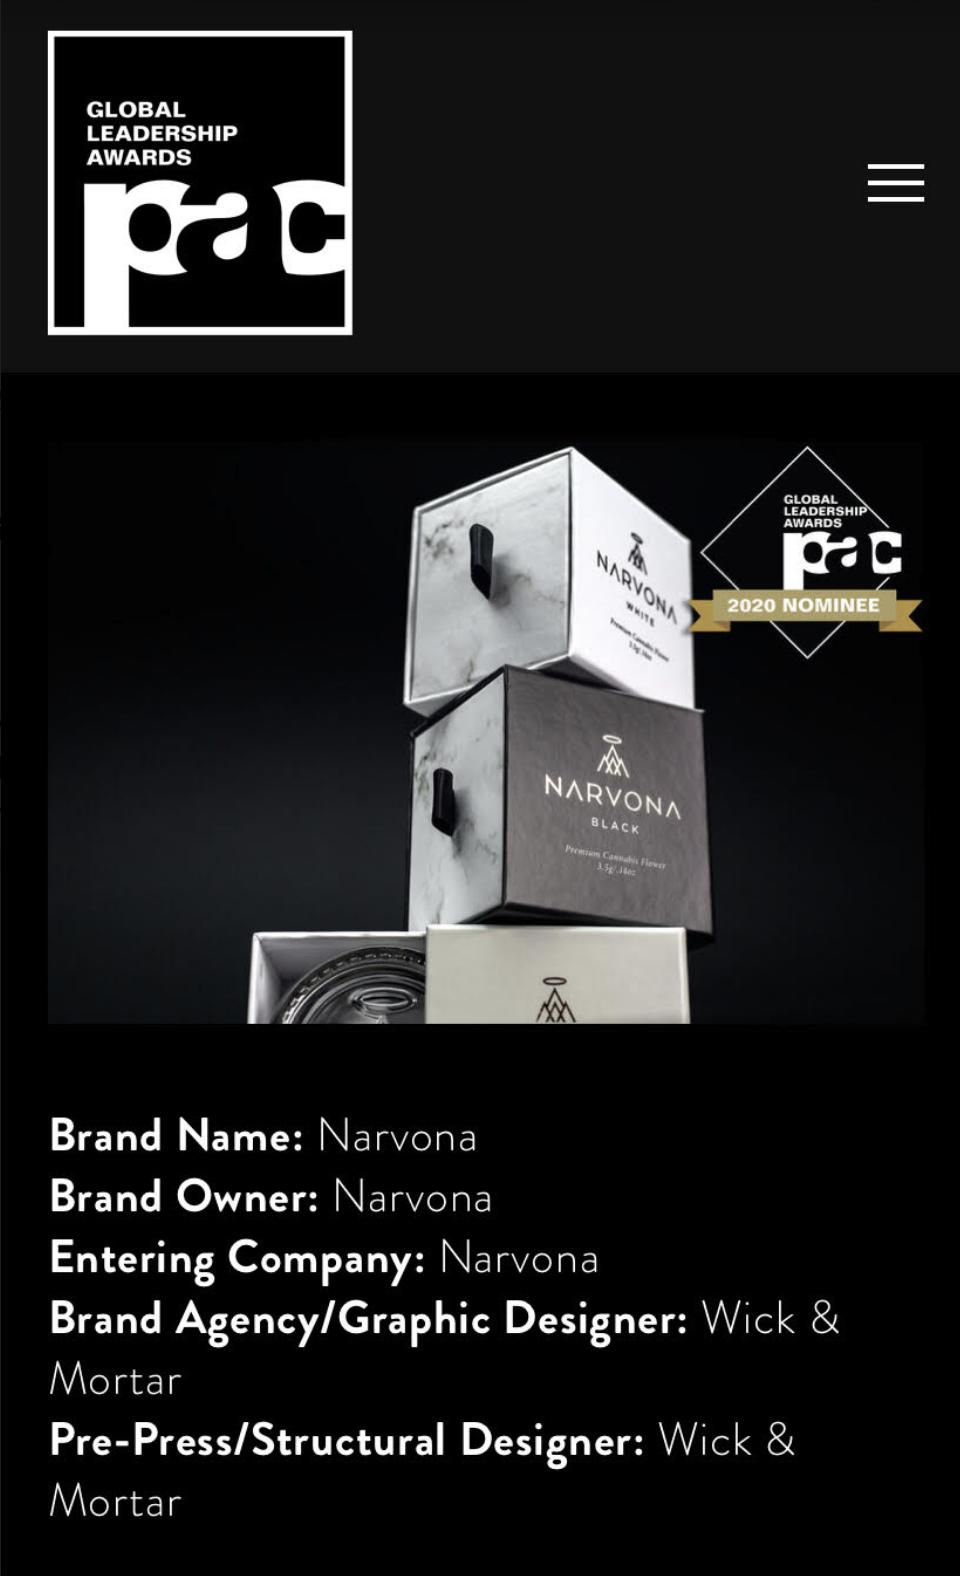 Narvona's Award Info